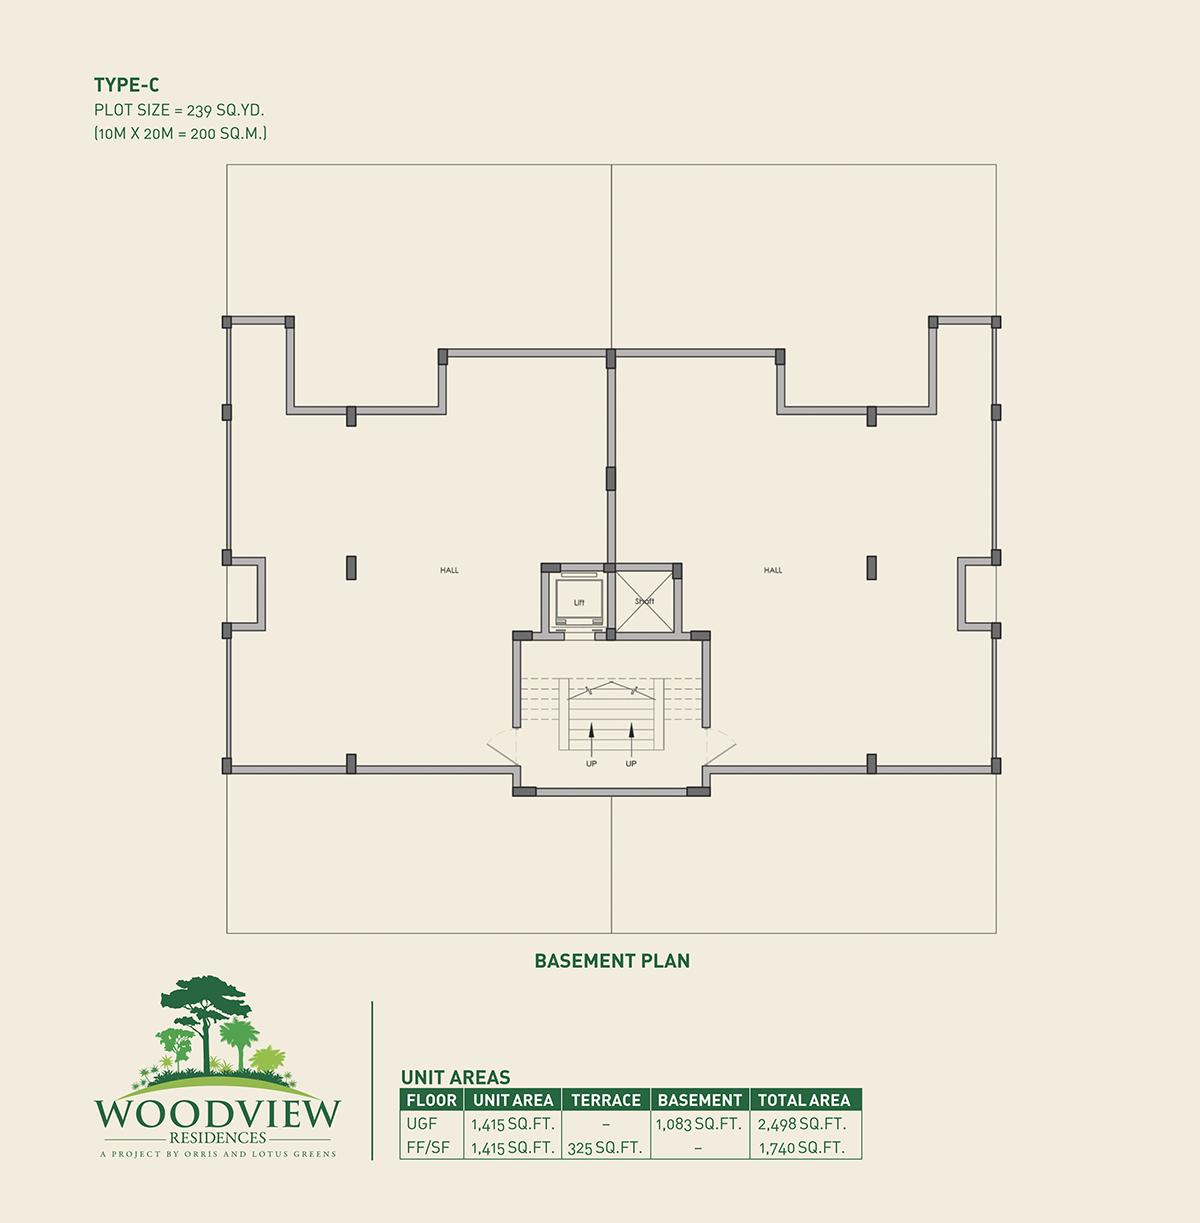 Woodview Apartments: 3 BHK Apartments Gurgaon